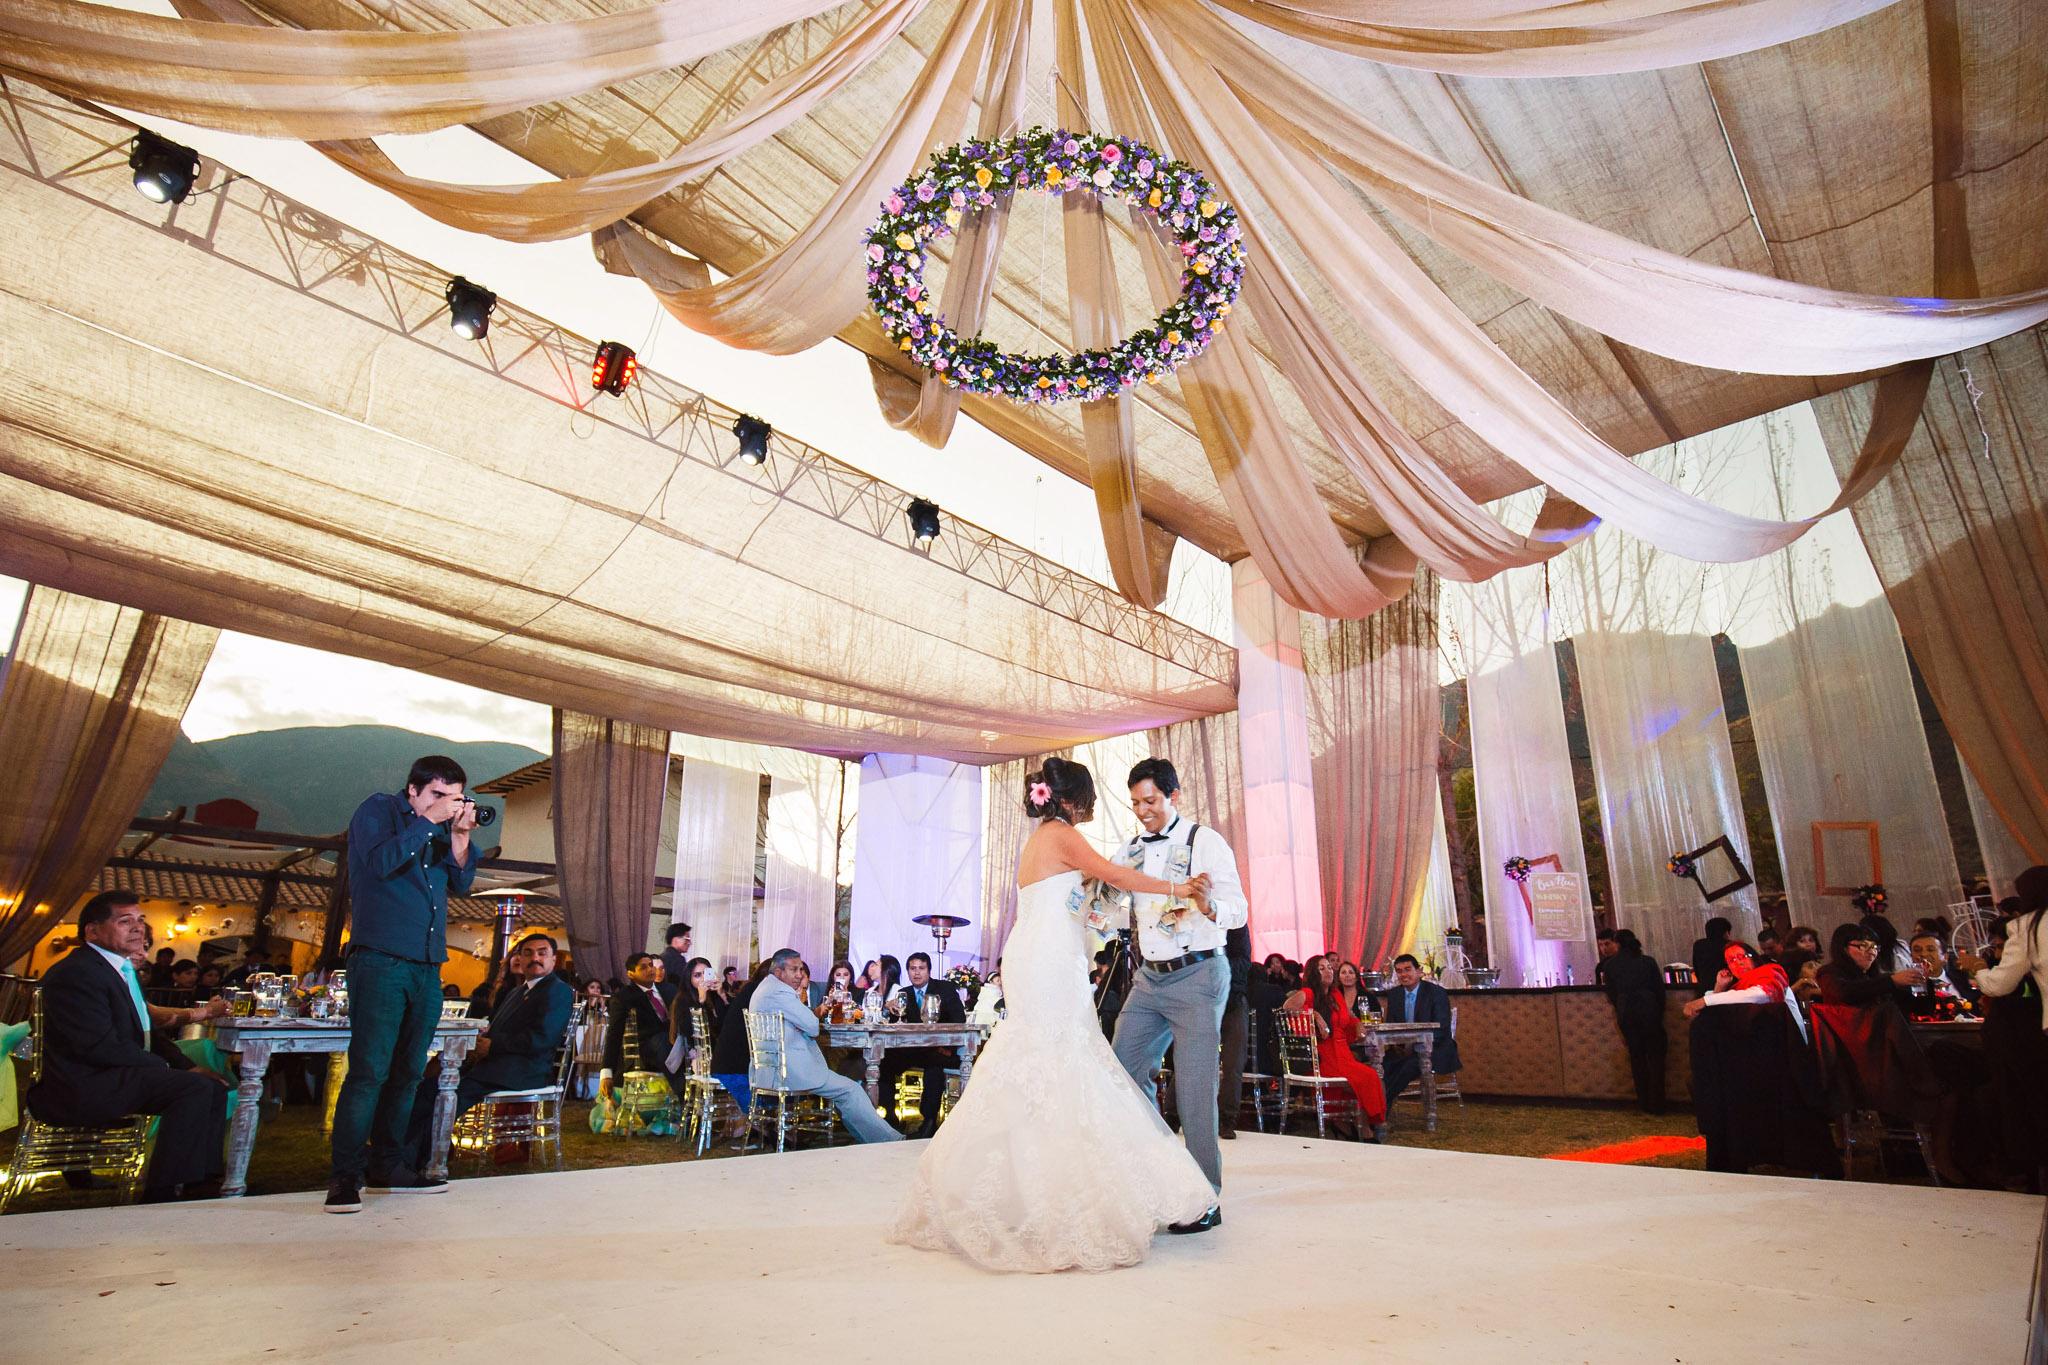 Wedding-Travellers-Destination-Wedding-Peru-Cusco-Hacienda-Sarapampa-Sacred-Valley-money-tradition